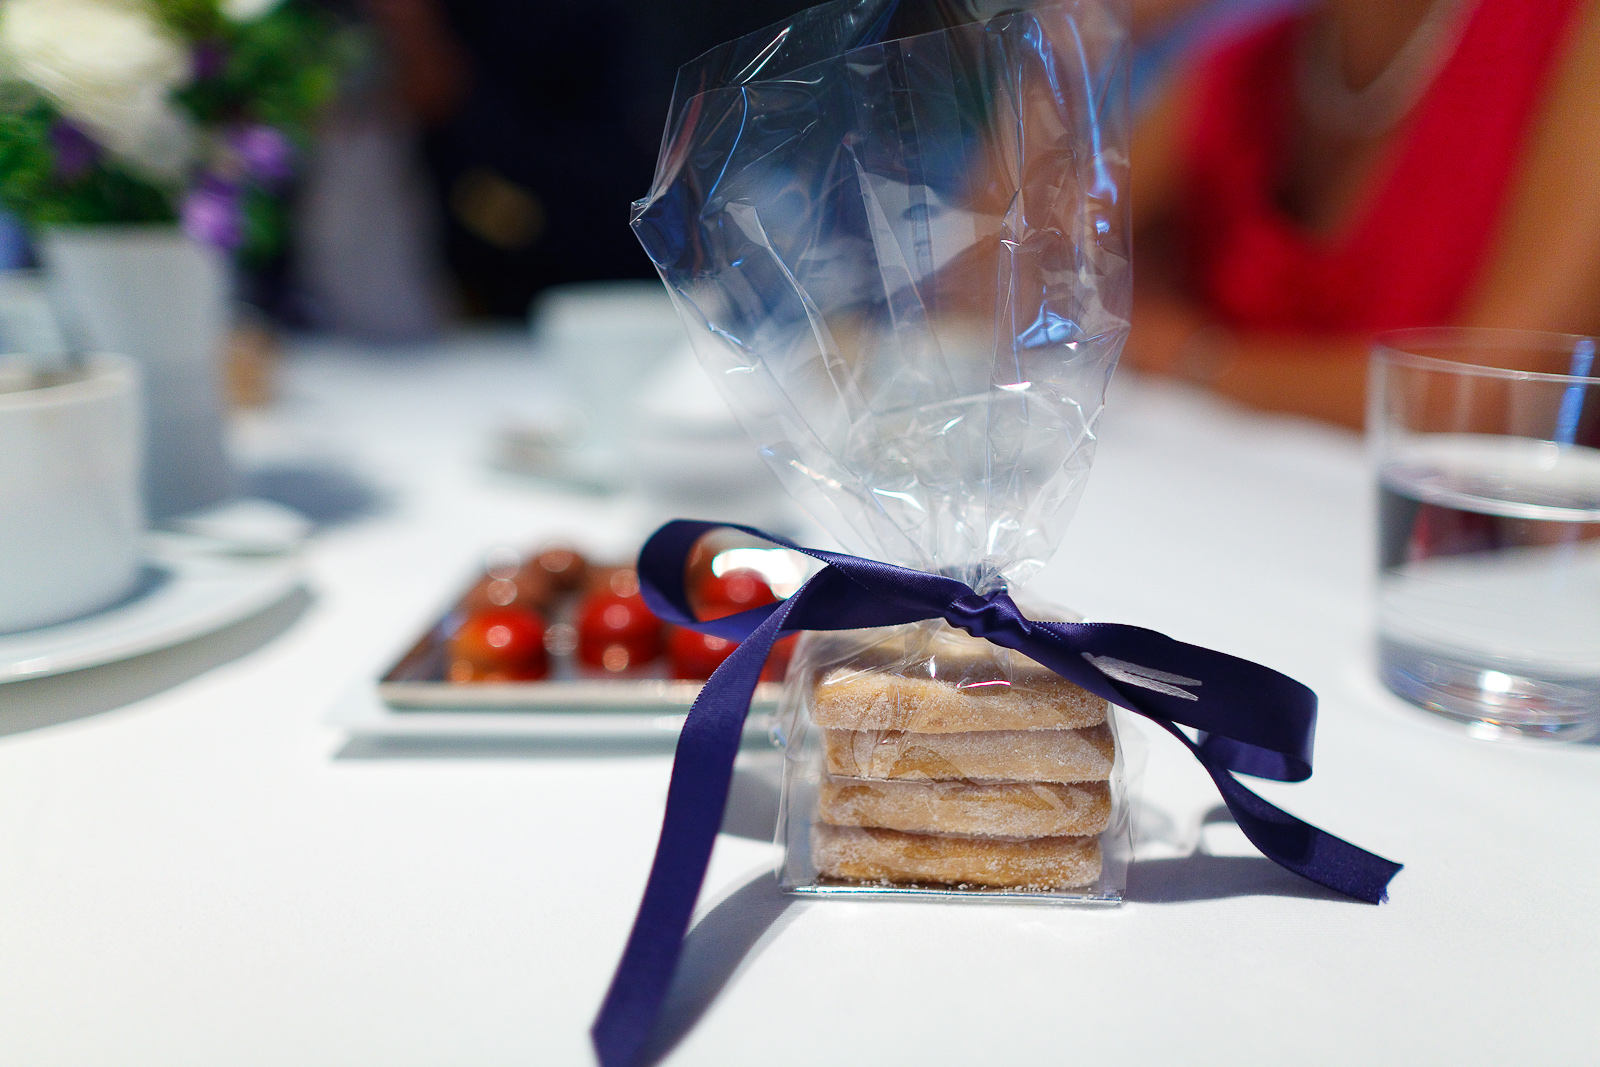 Take home shortbread cookies